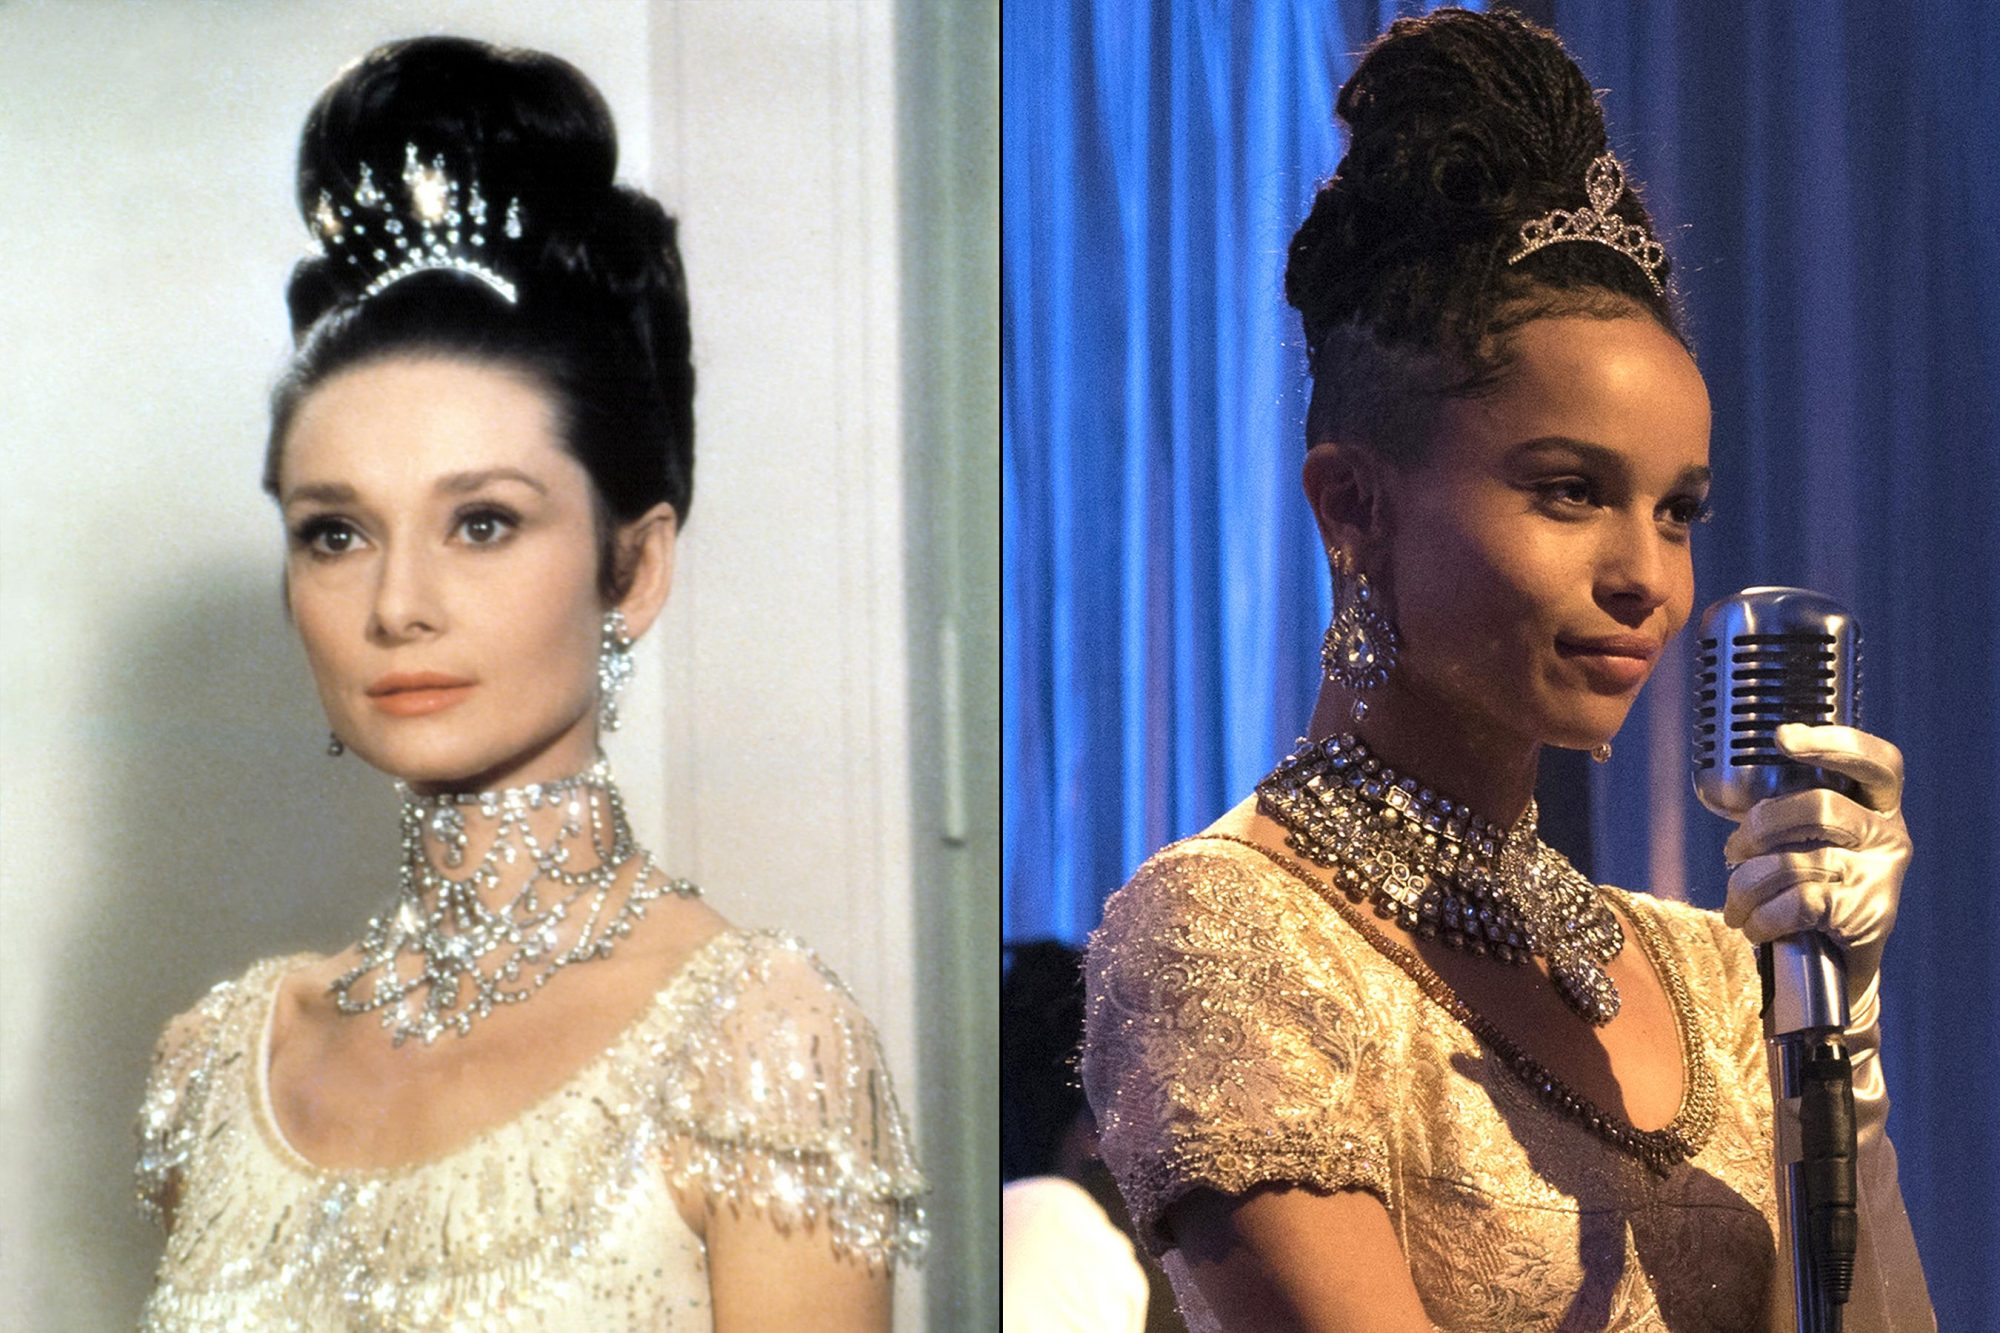 Zoe-Kravitz-as-Audrey-in-My-Fair-Lady